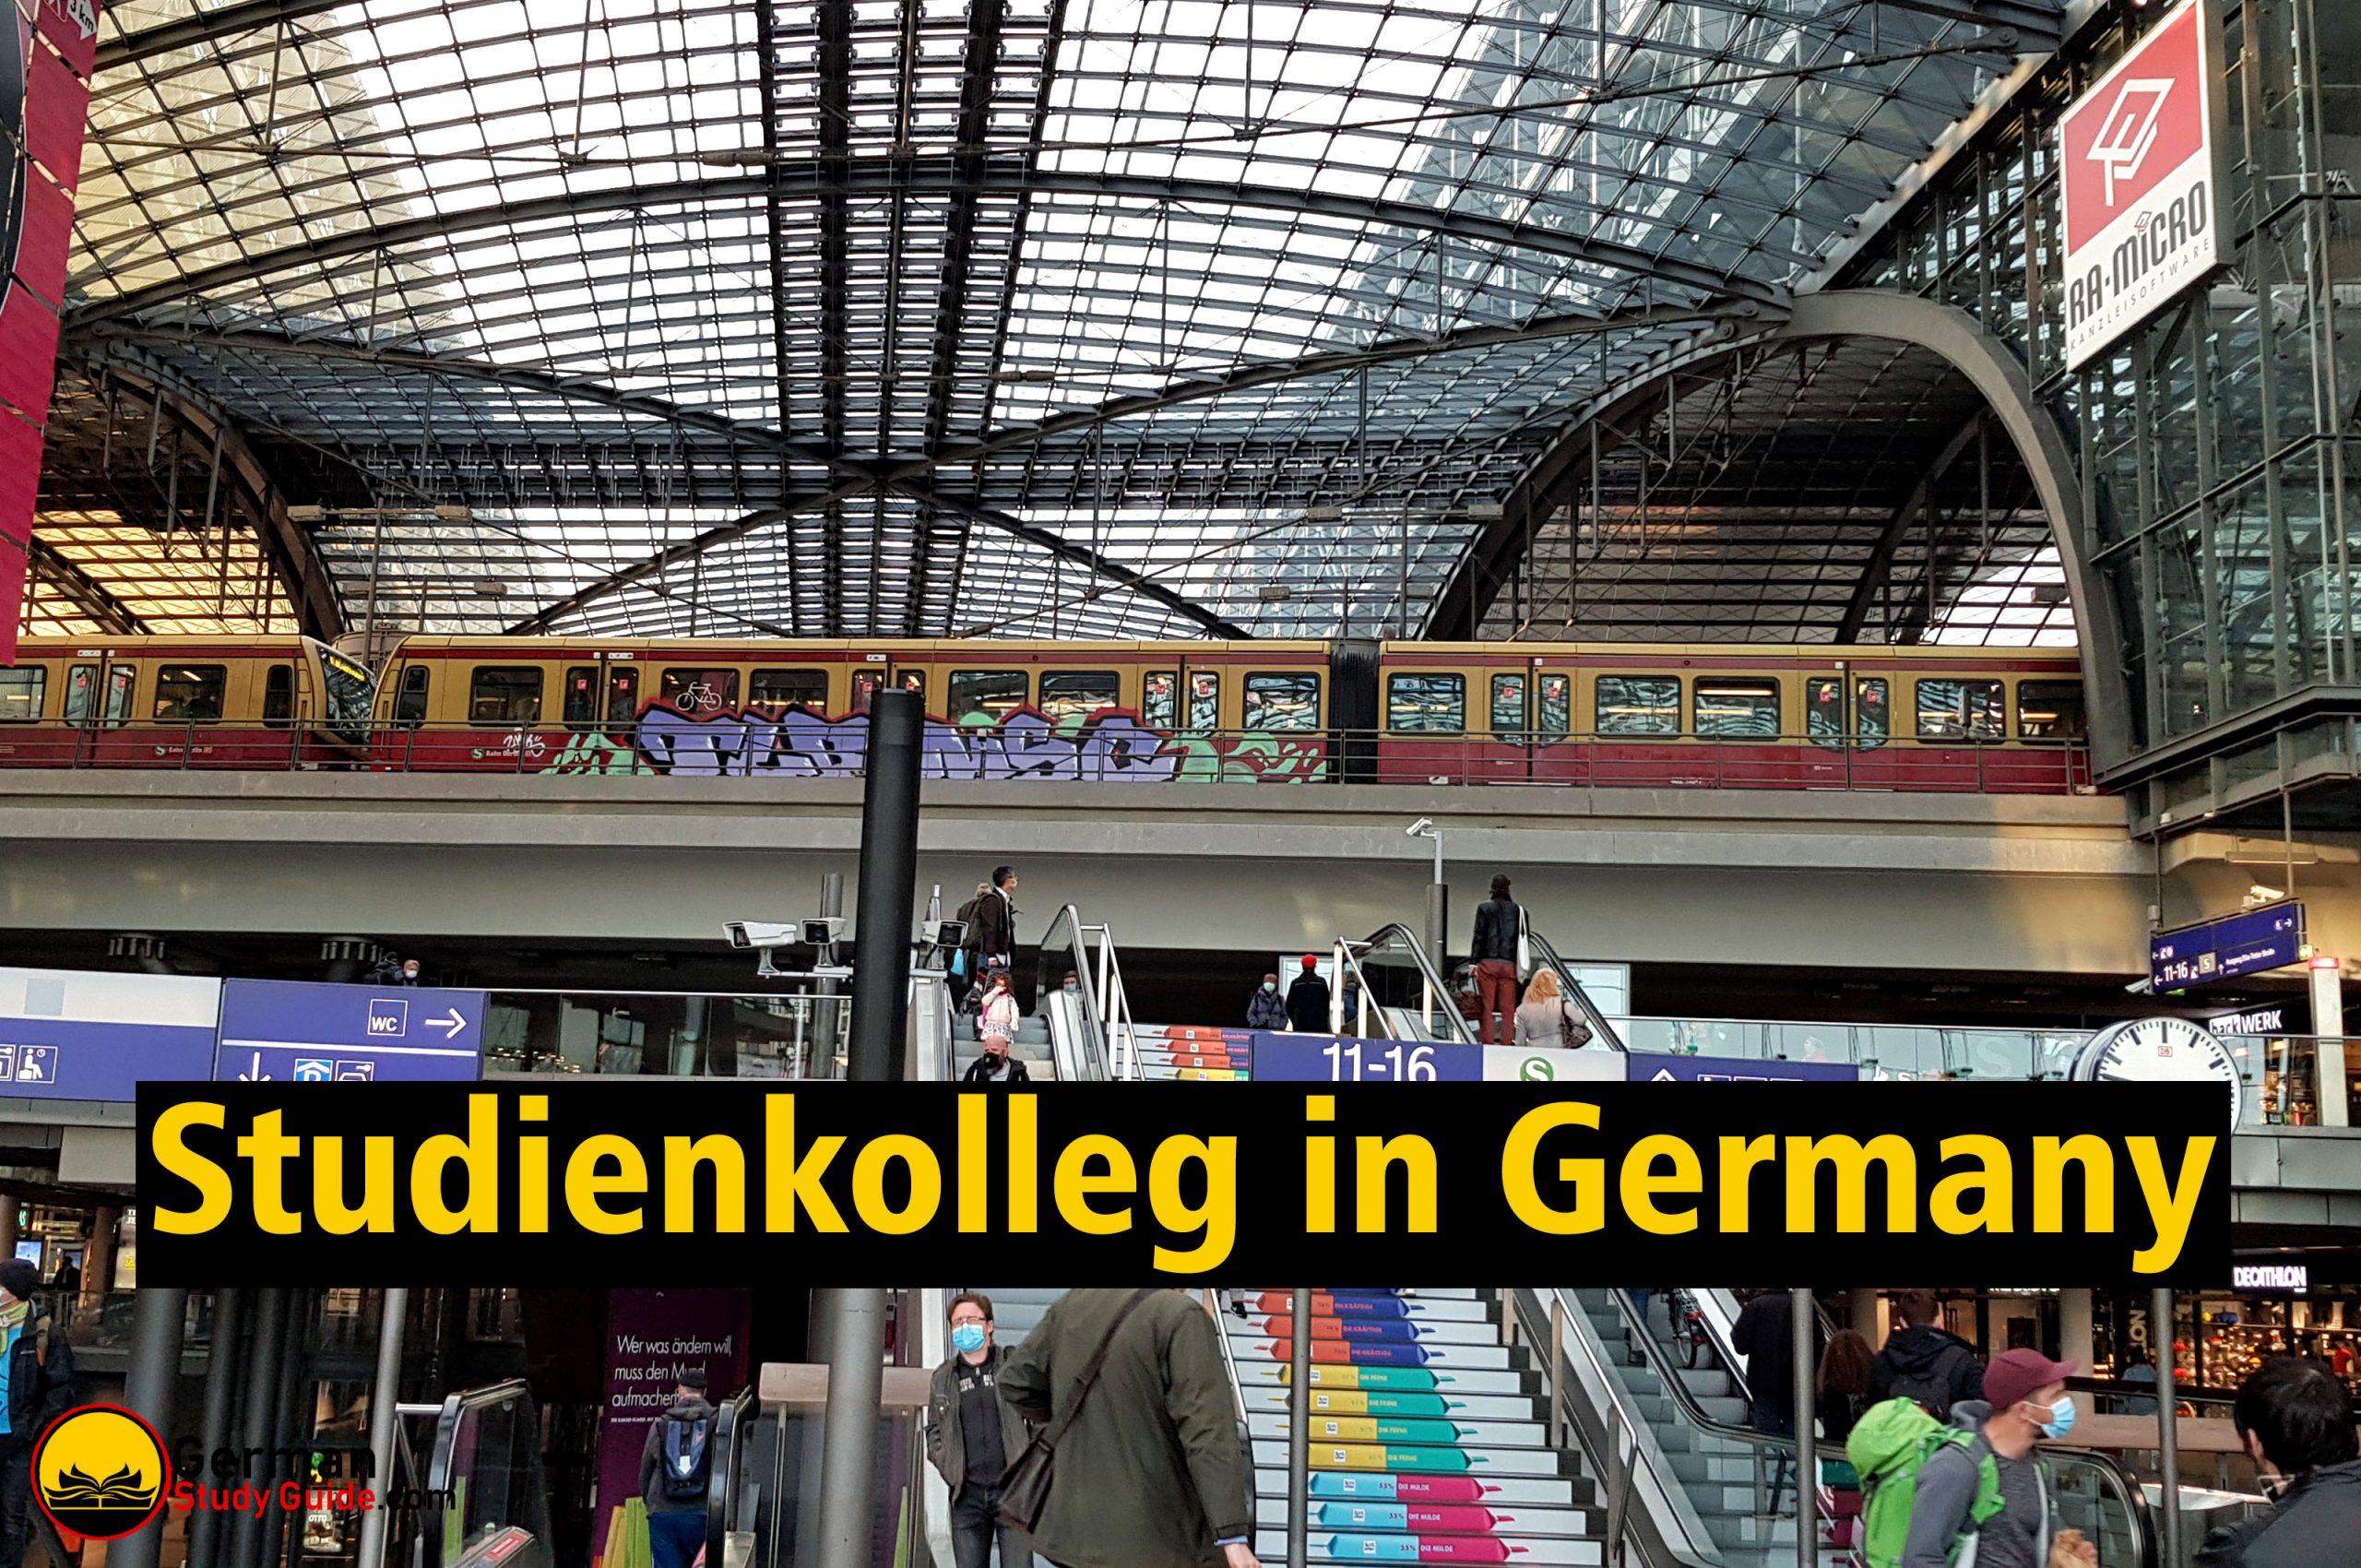 Free Studienkolleg in Germany